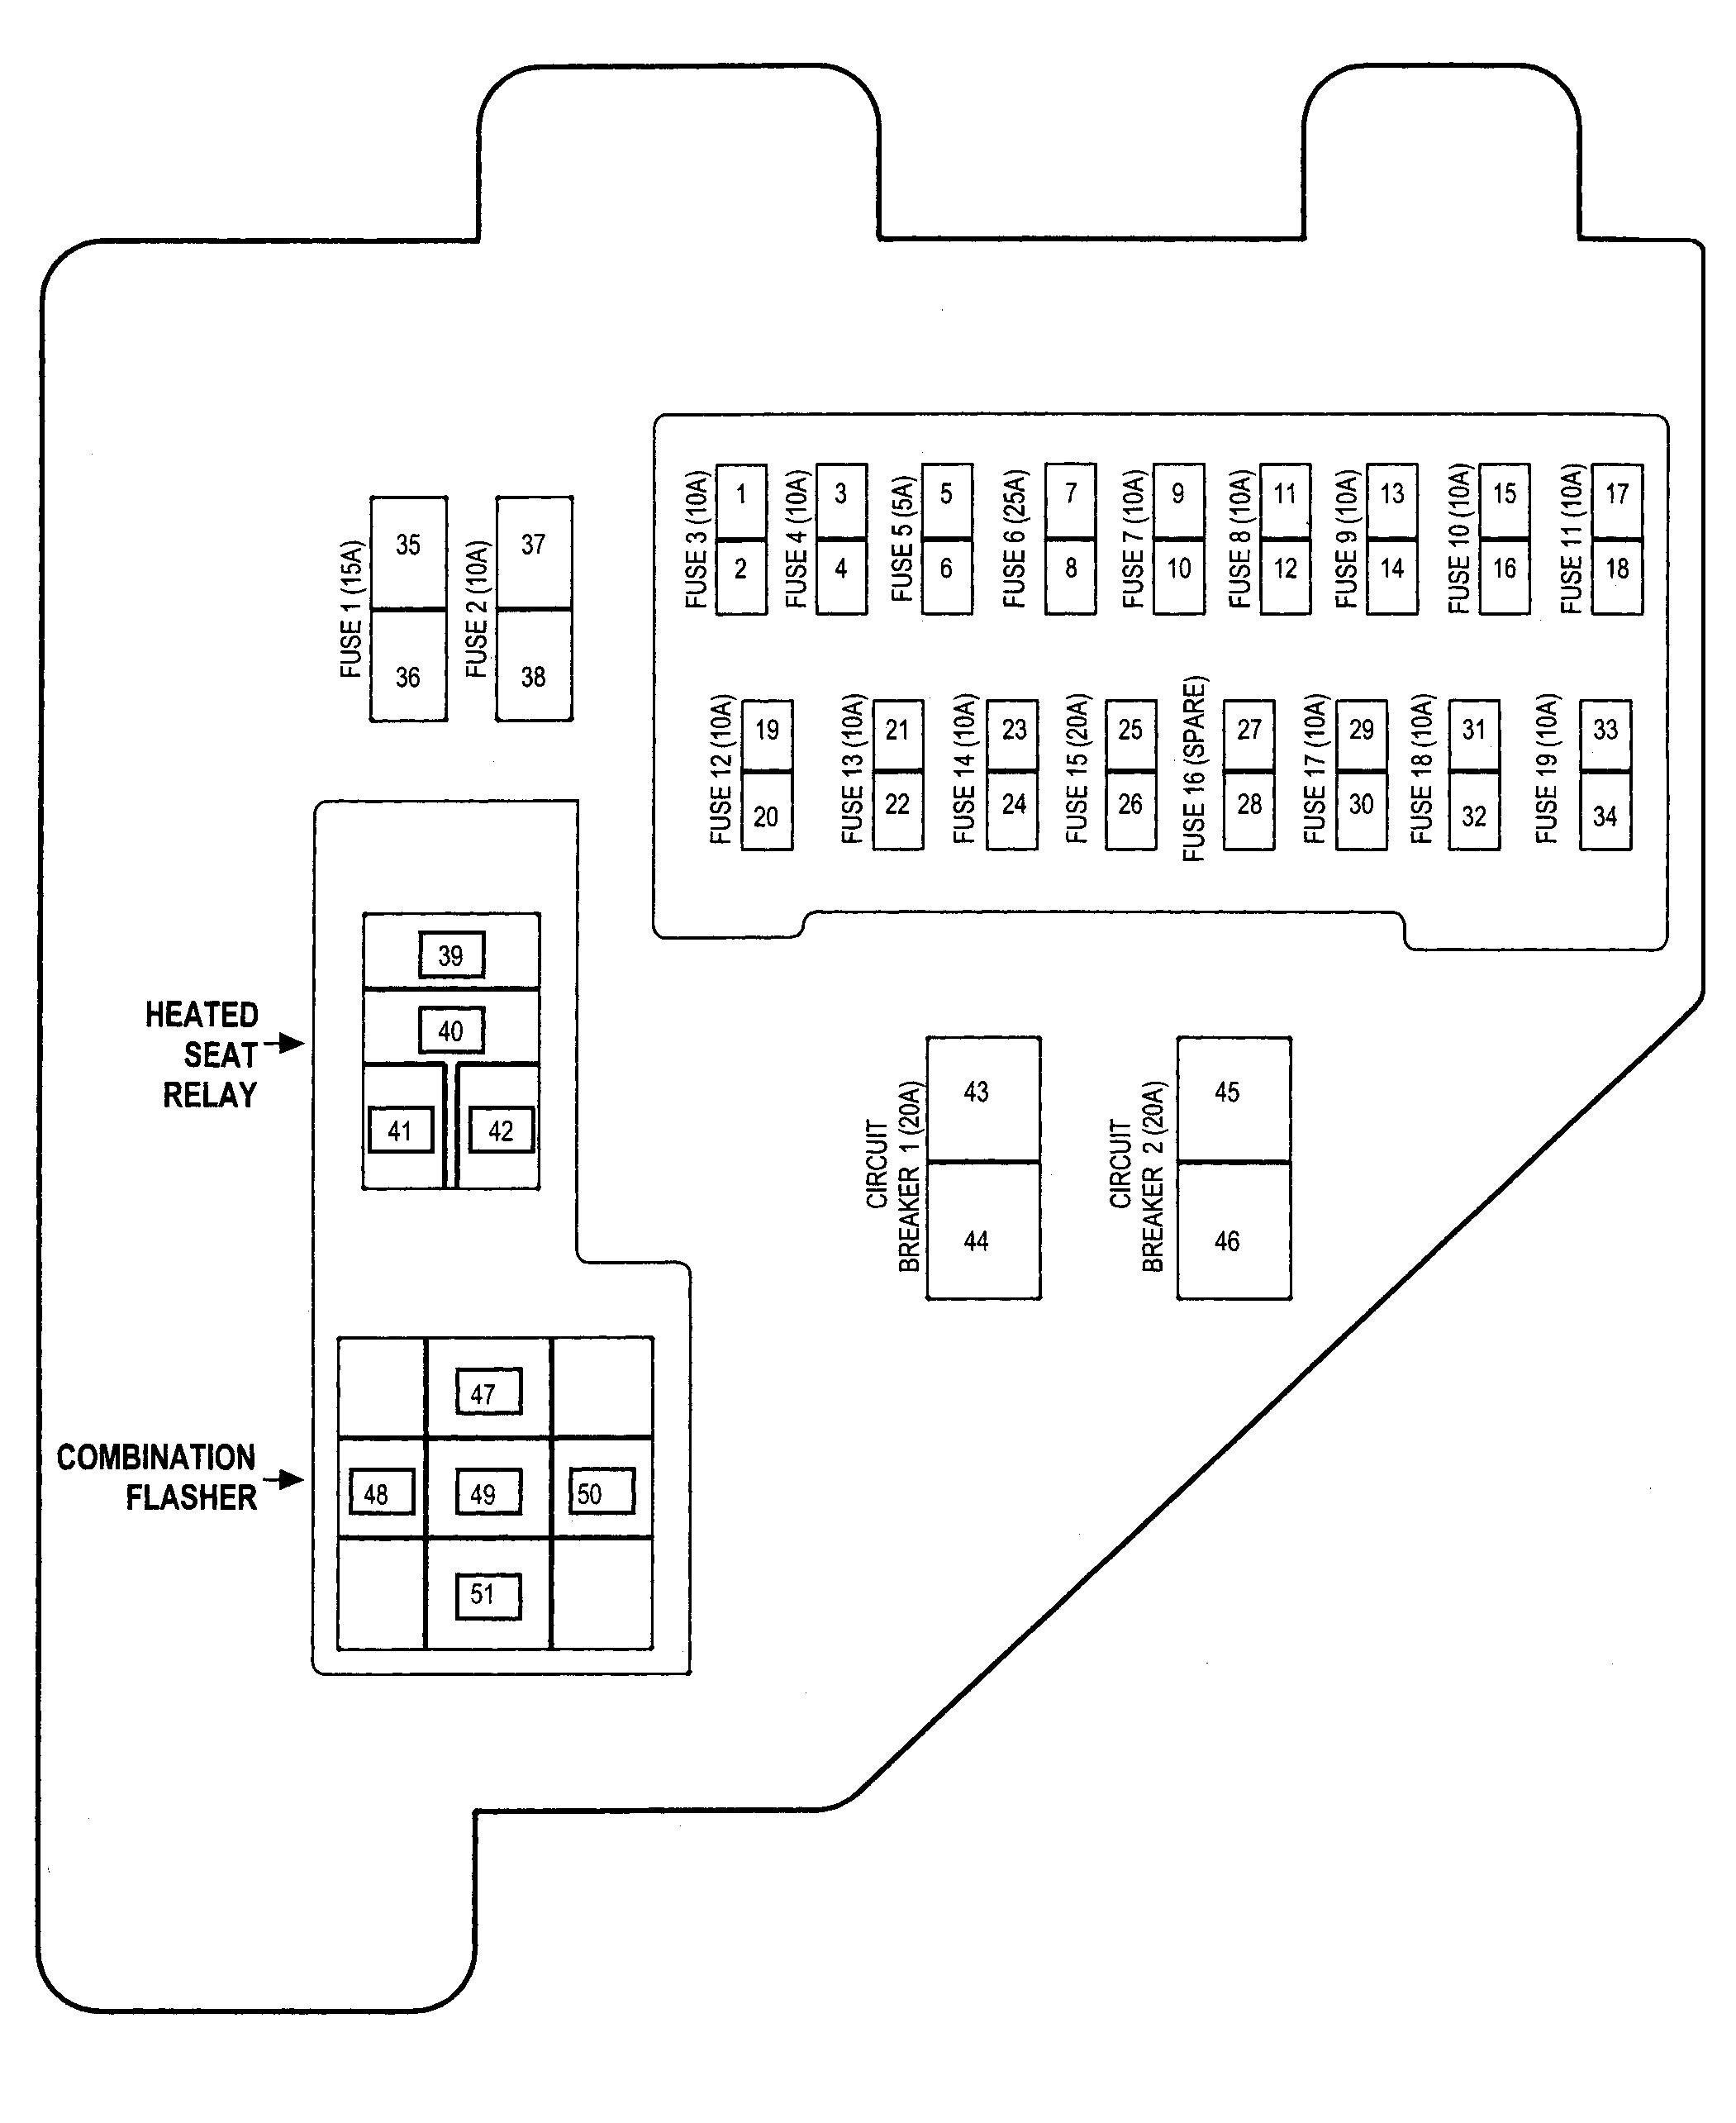 wiring diagram for 2010 dodge ram 1500 ry 3484  dodge diesel wiring distribution schematic wiring  dodge diesel wiring distribution